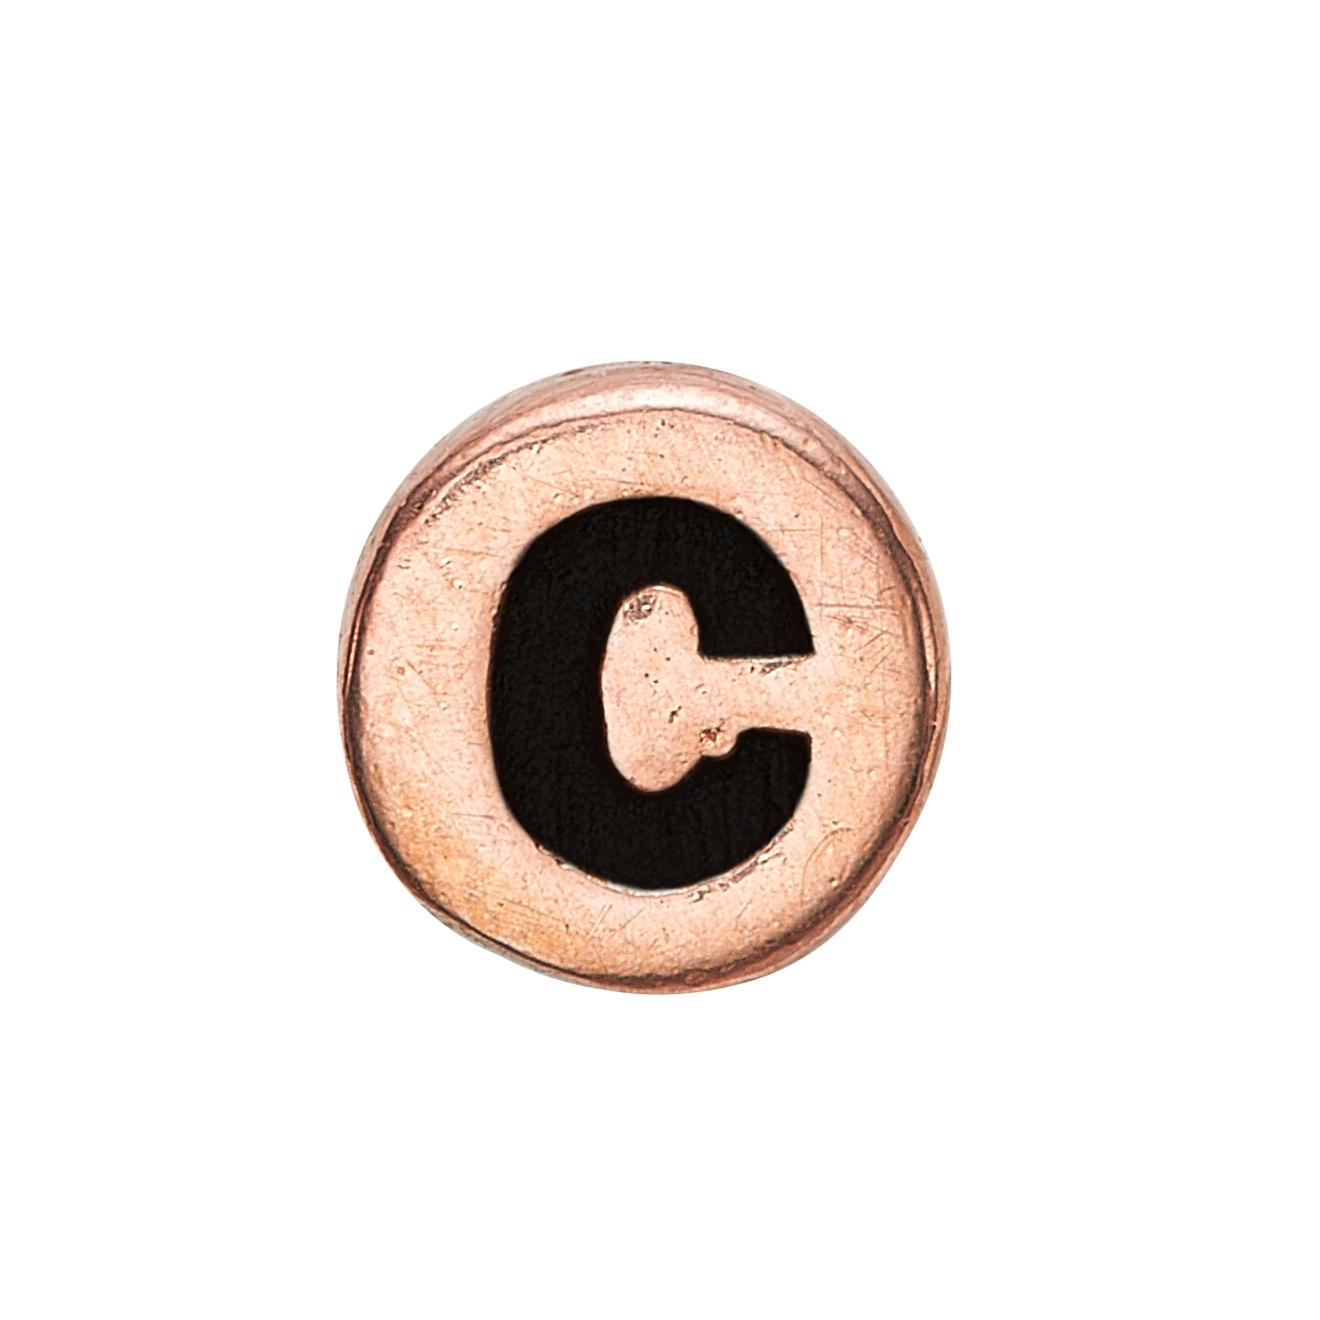 christina watches – Christina collect element - 603-r-c fra brodersen + kobborg